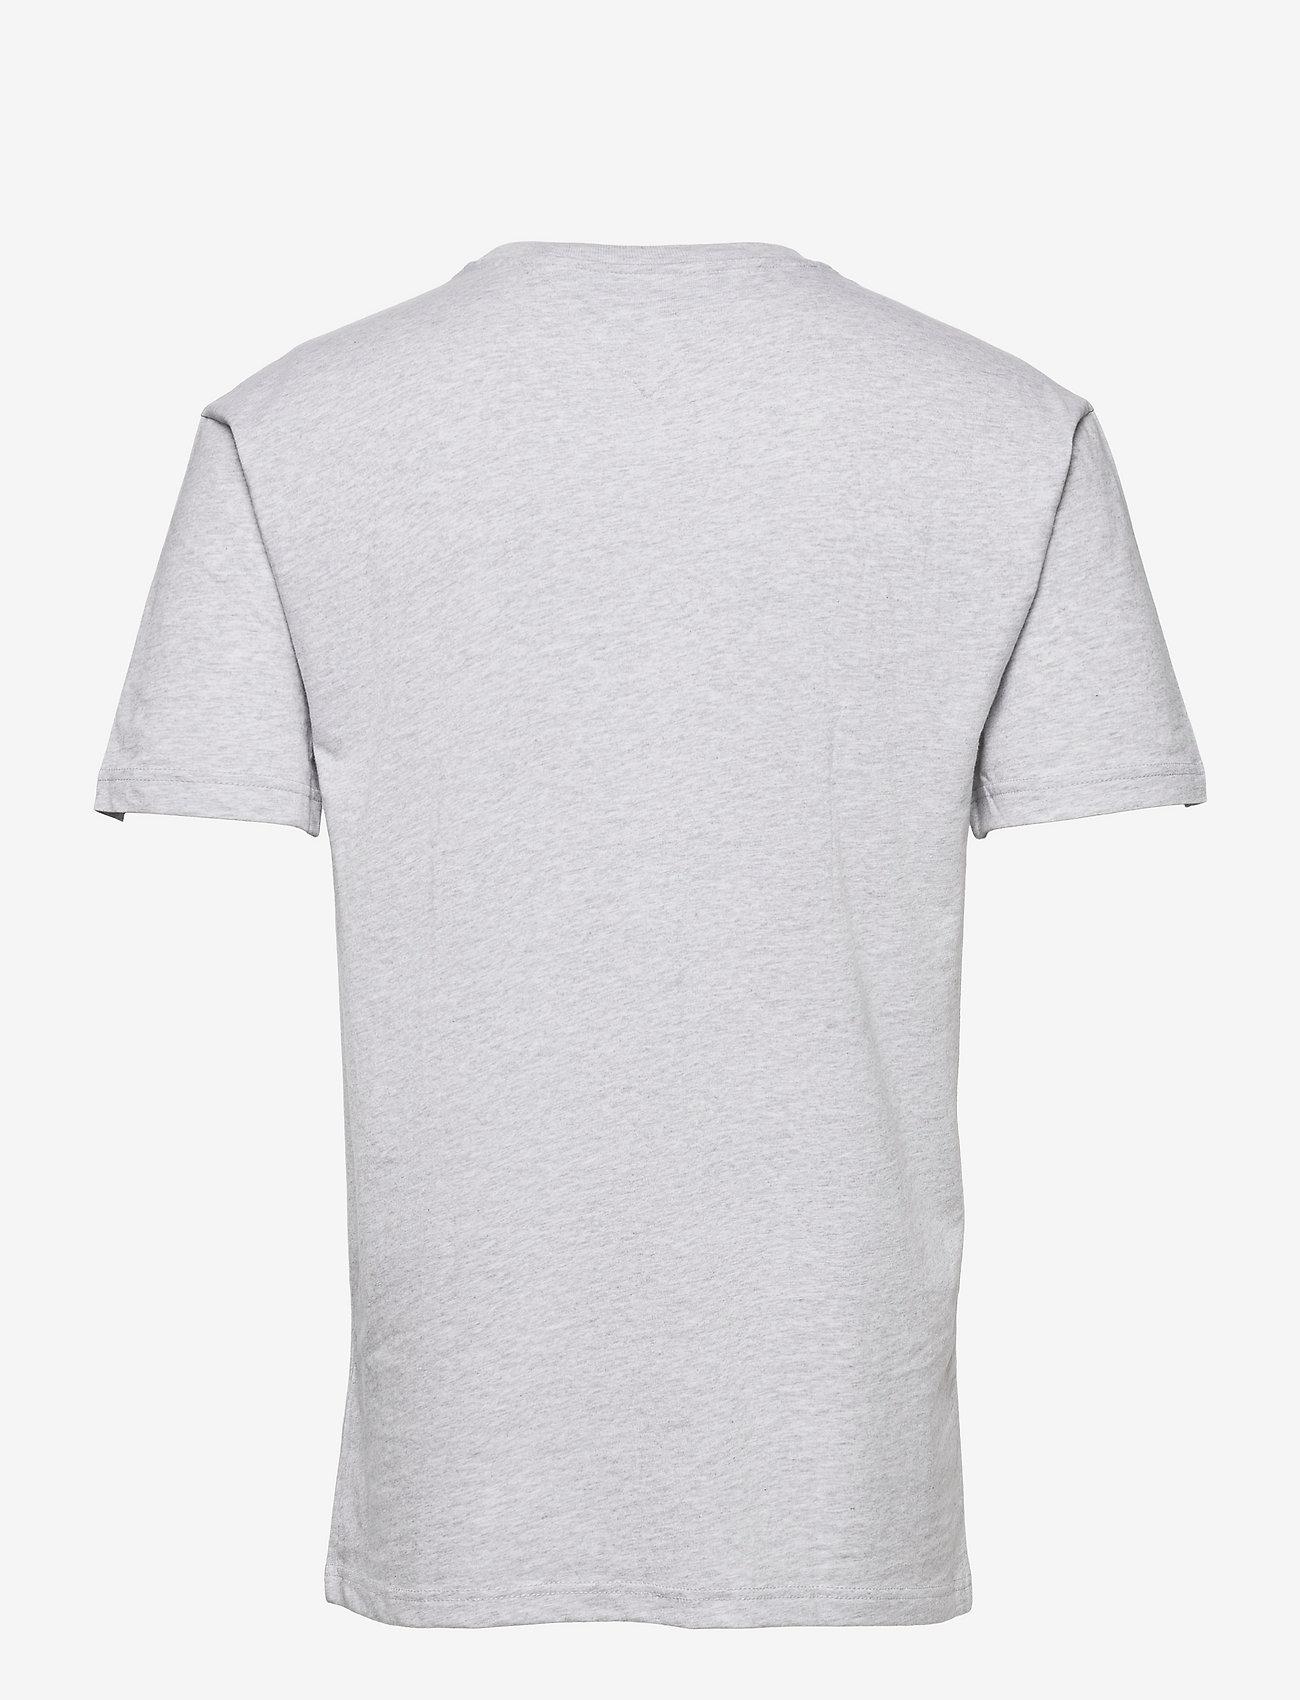 Tommy Jeans - TJM VARSITY BBALL GRAPHIC TEE - kortärmade t-shirts - silver grey htr - 1